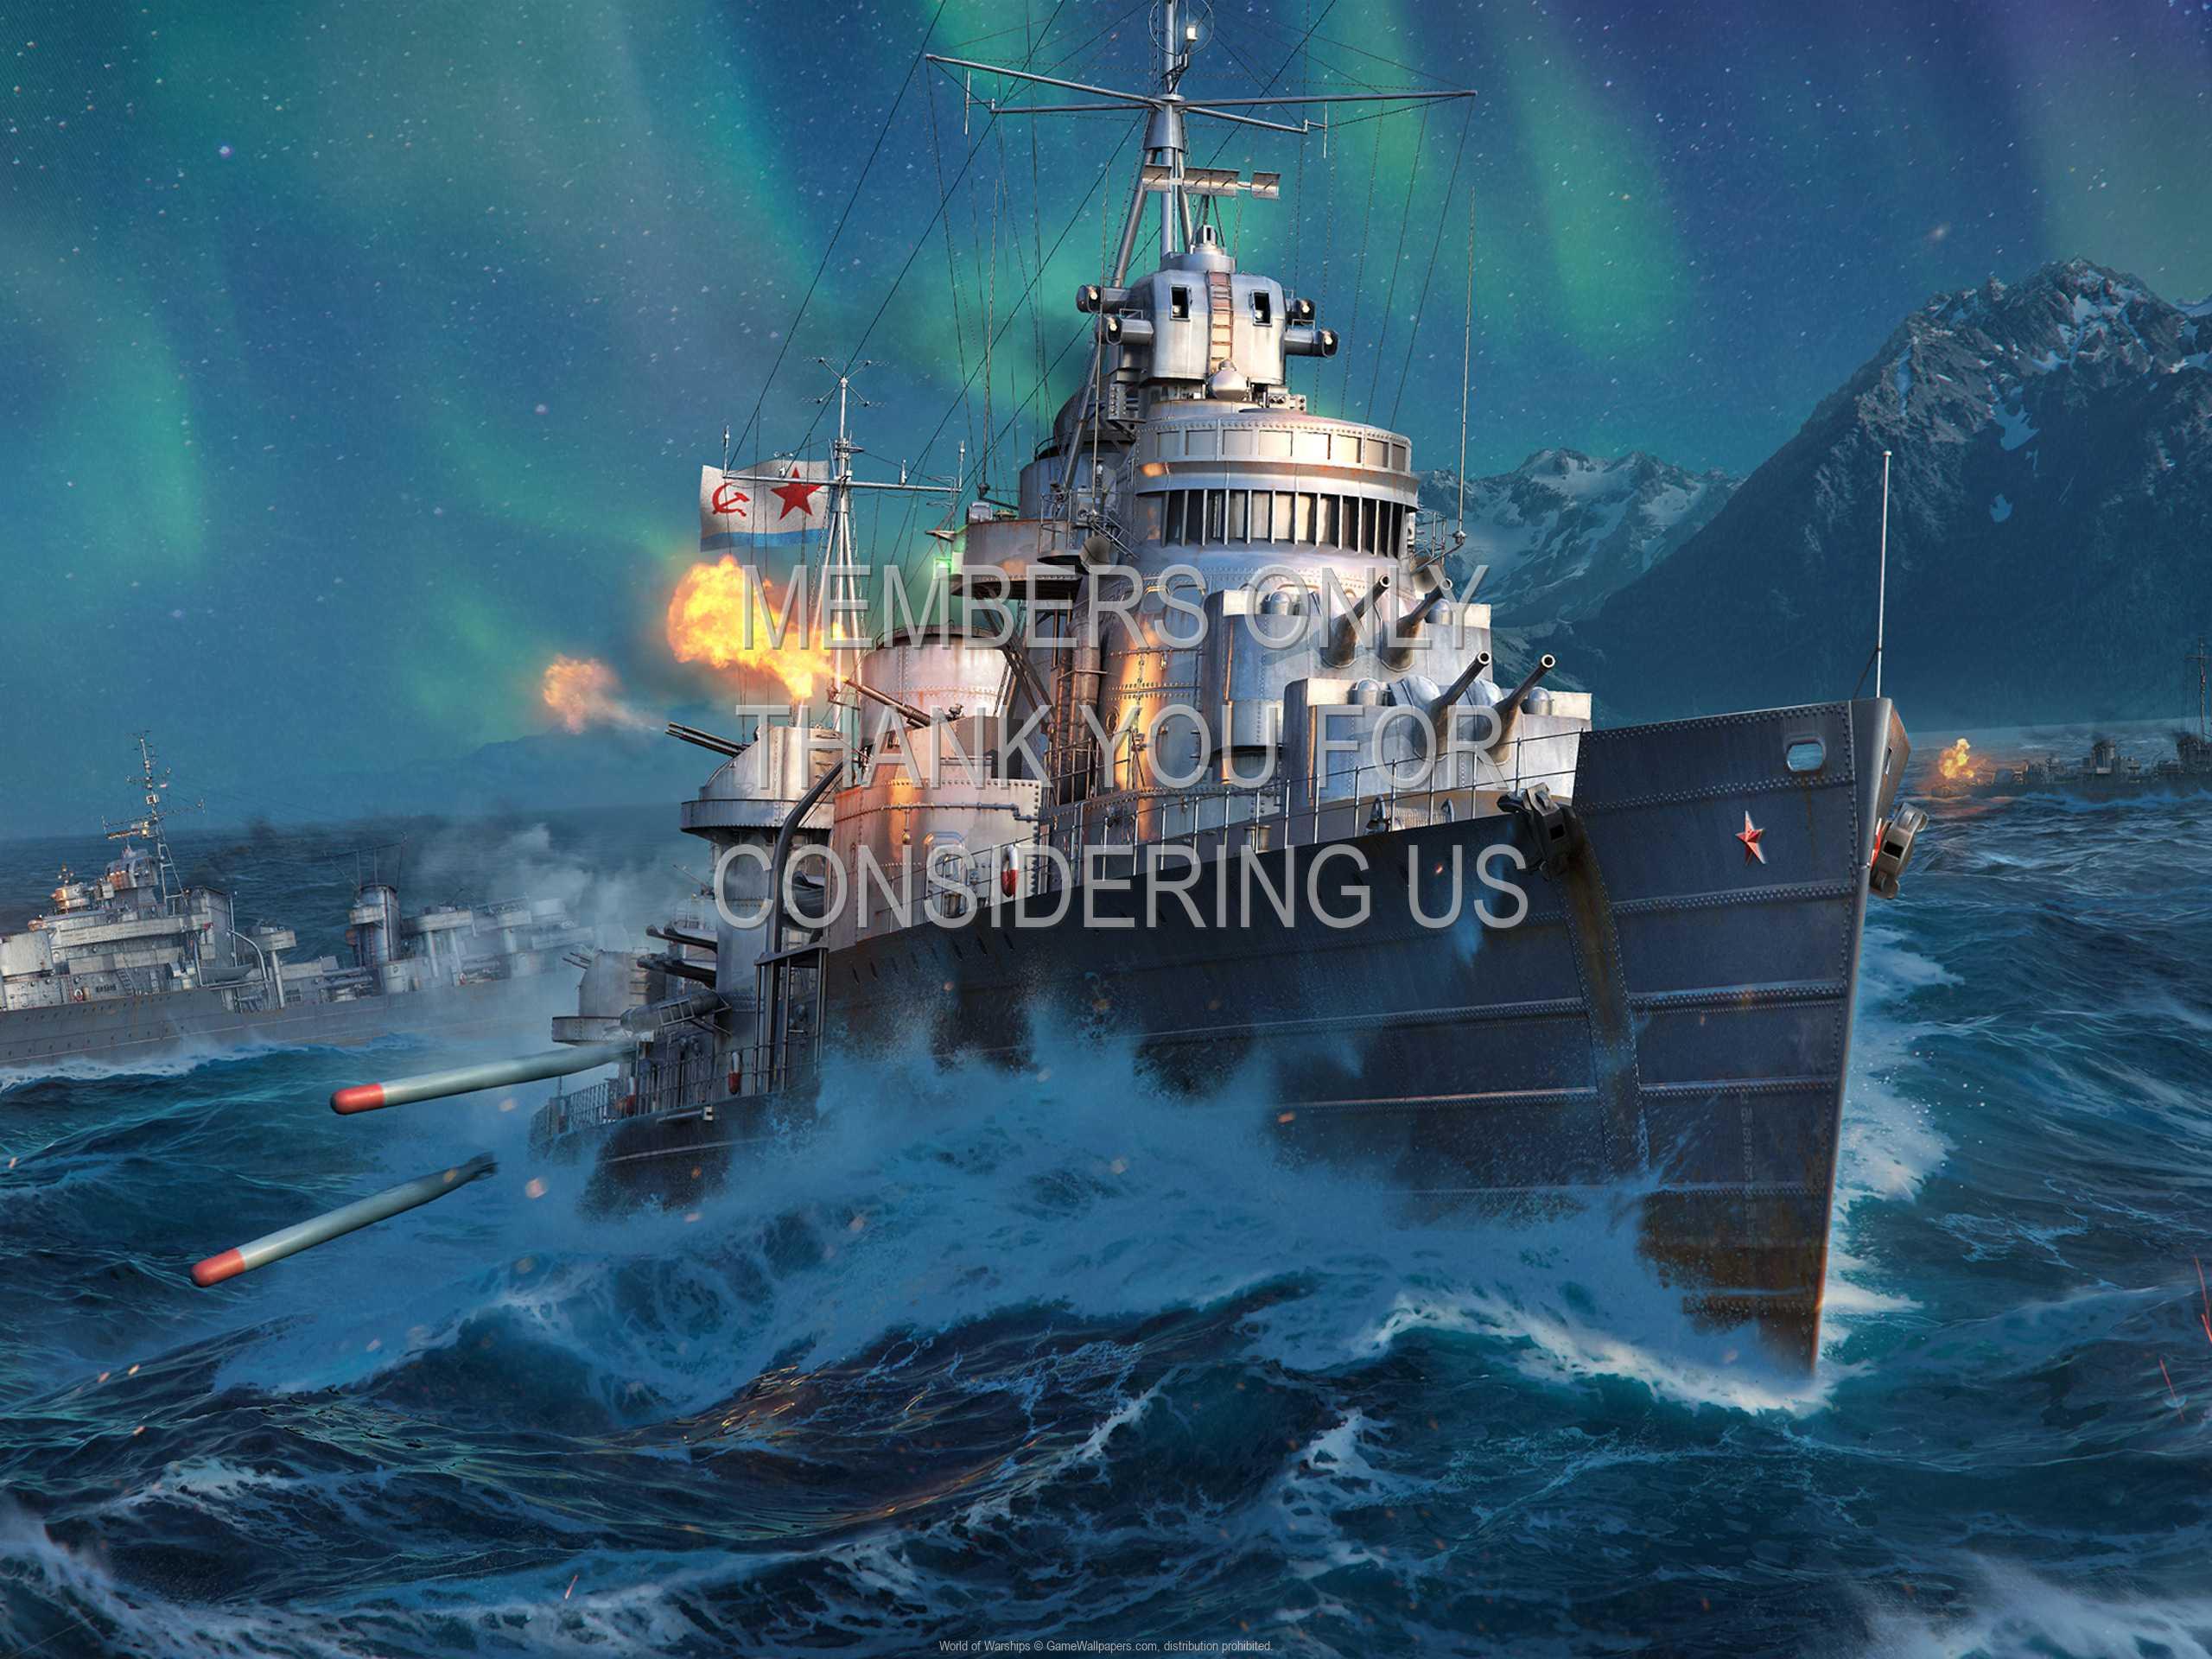 World of Warships 1080p Horizontal Mobile wallpaper or background 07